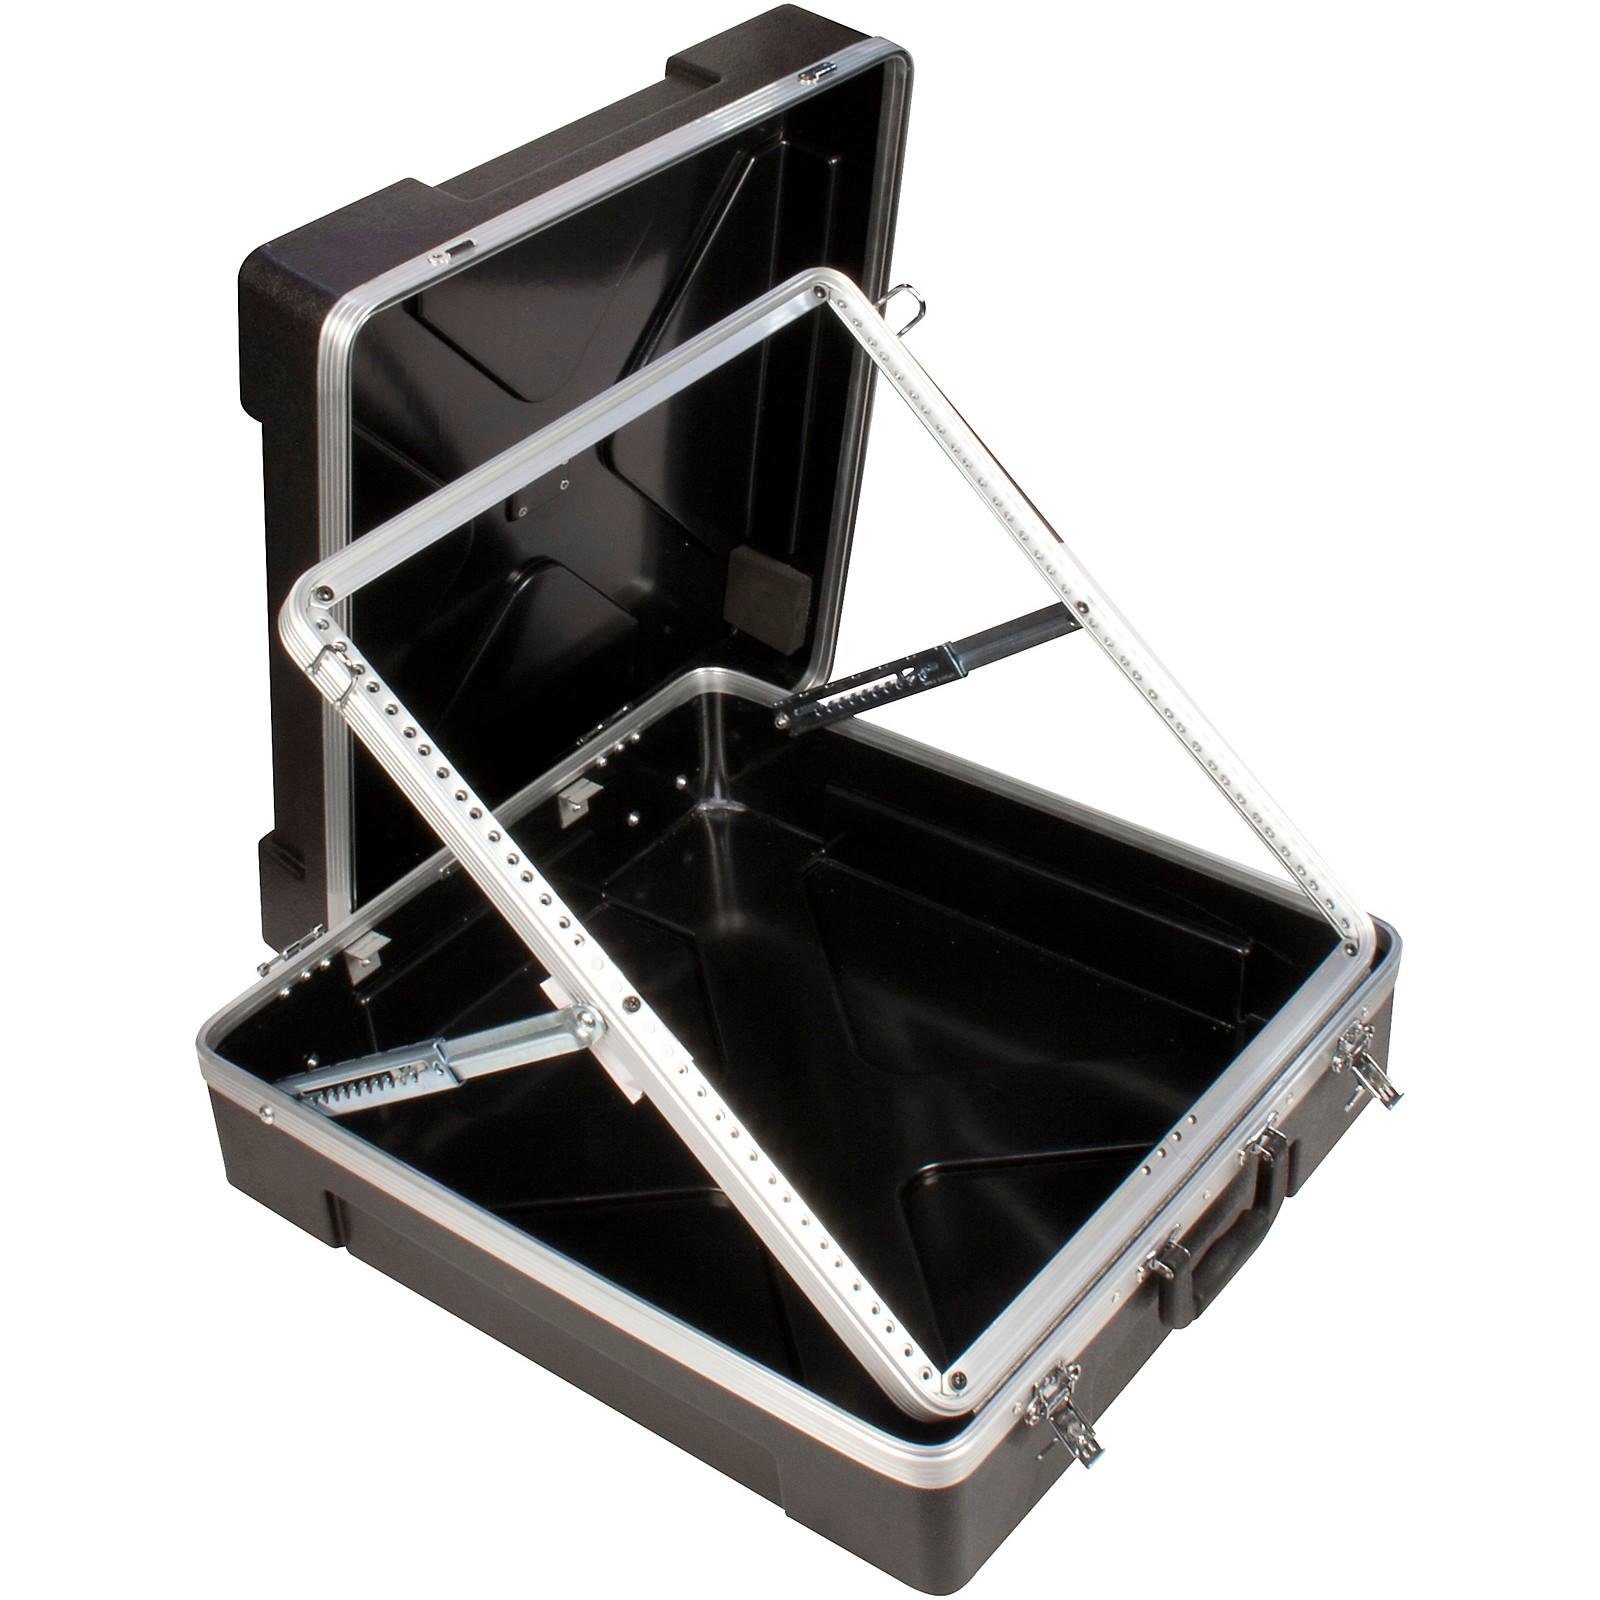 Ultimate Support DuraCase USL-12 Pop-Up Mixer Case